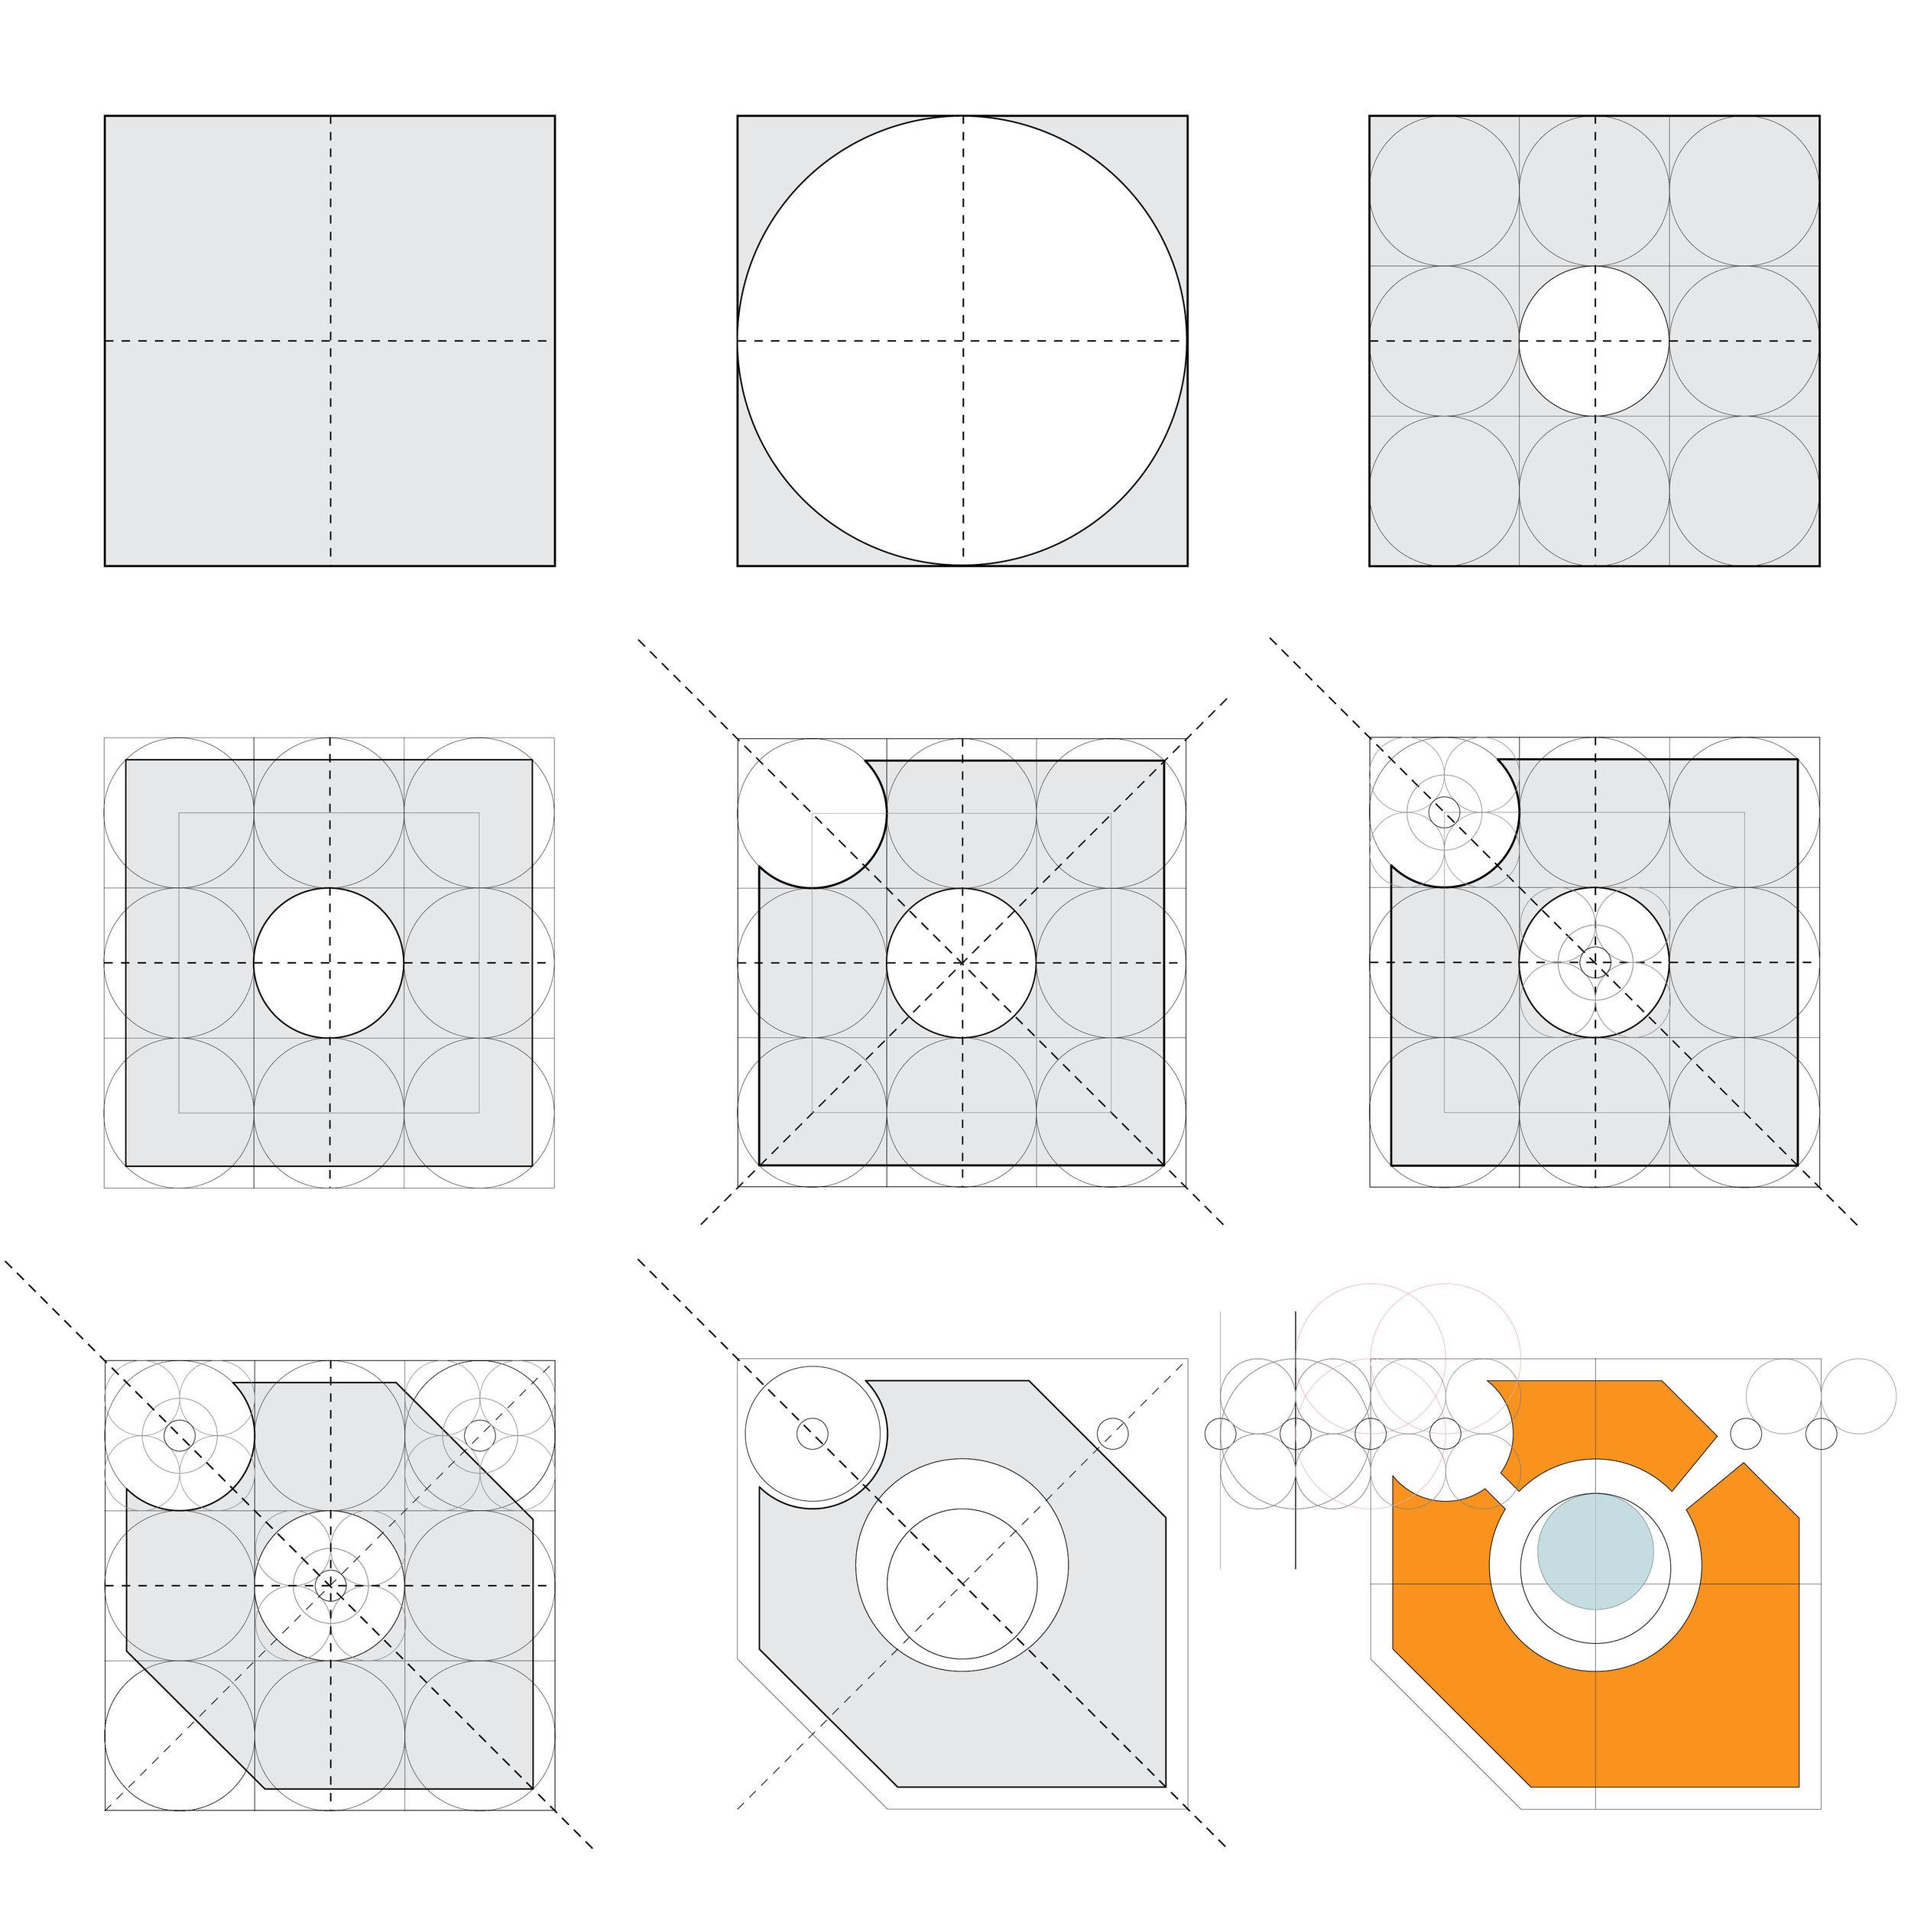 DameronArchitecture_SikhTempleWisconsin_7.jpg